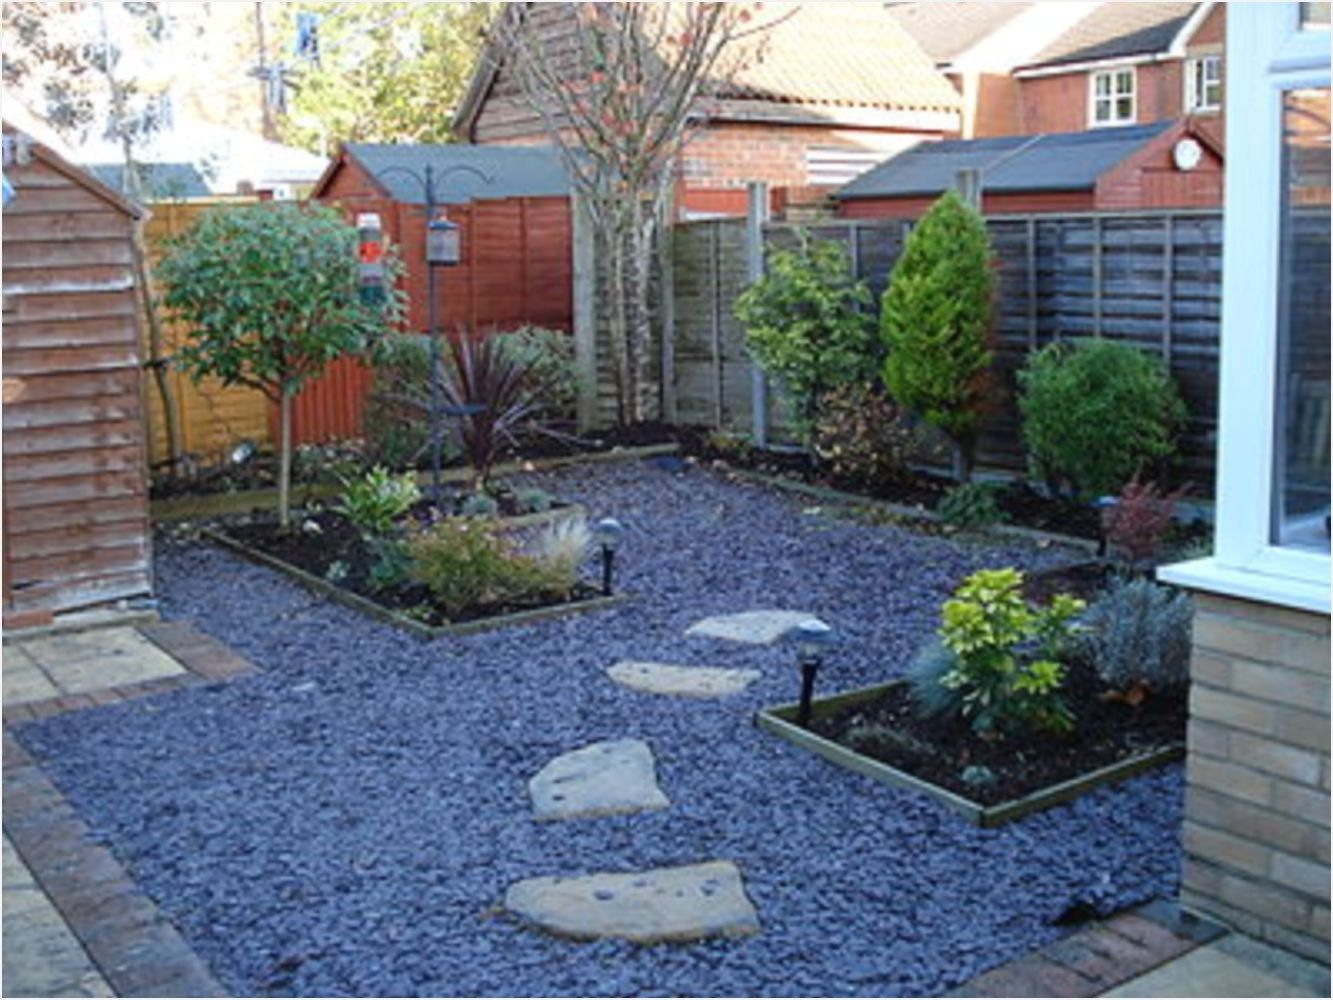 40 Perfect Backyard Landscape Ideas Without Grass Easy Backyard Landscaping Backyard Grass Landscaping No Grass Backyard